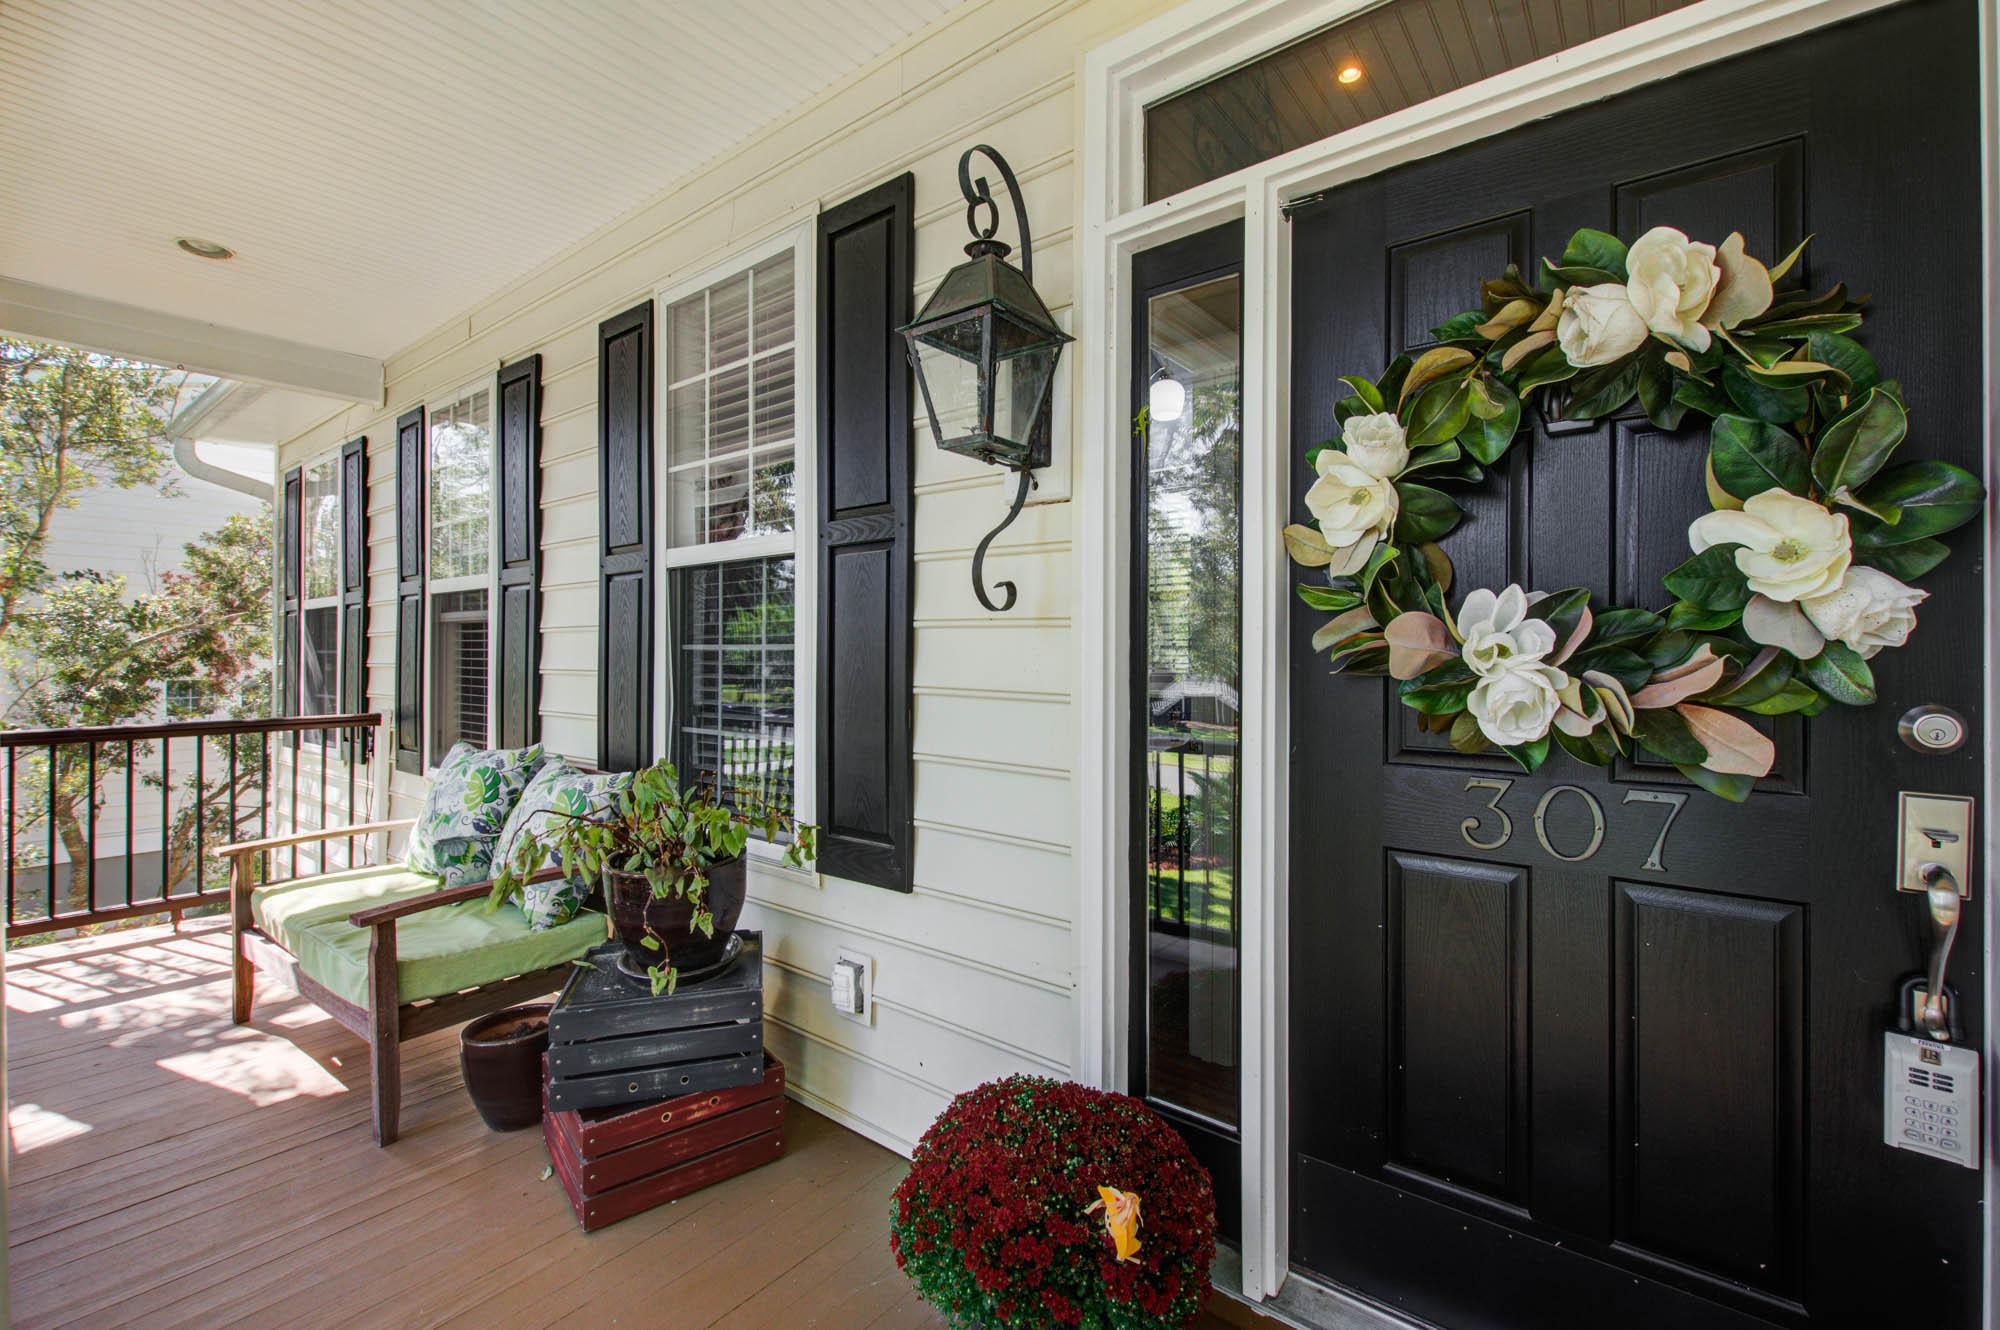 St Thomas Point Homes For Sale - 307 Jamesbury, Charleston, SC - 1